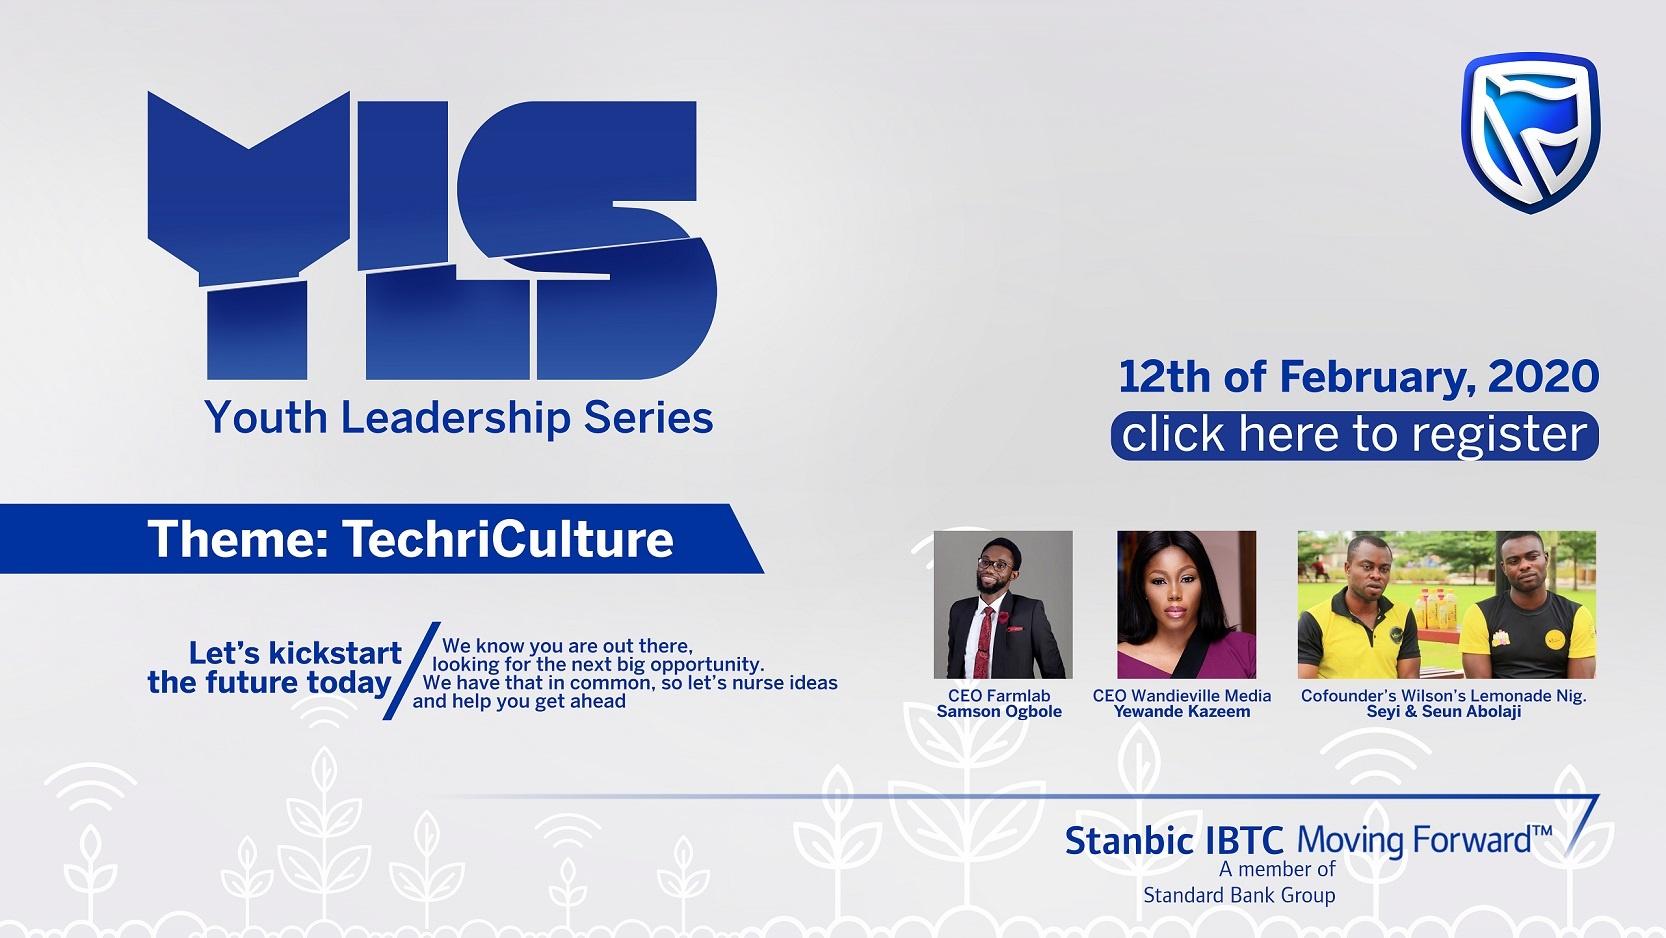 Stanbic IBTC Youth Leadership Series